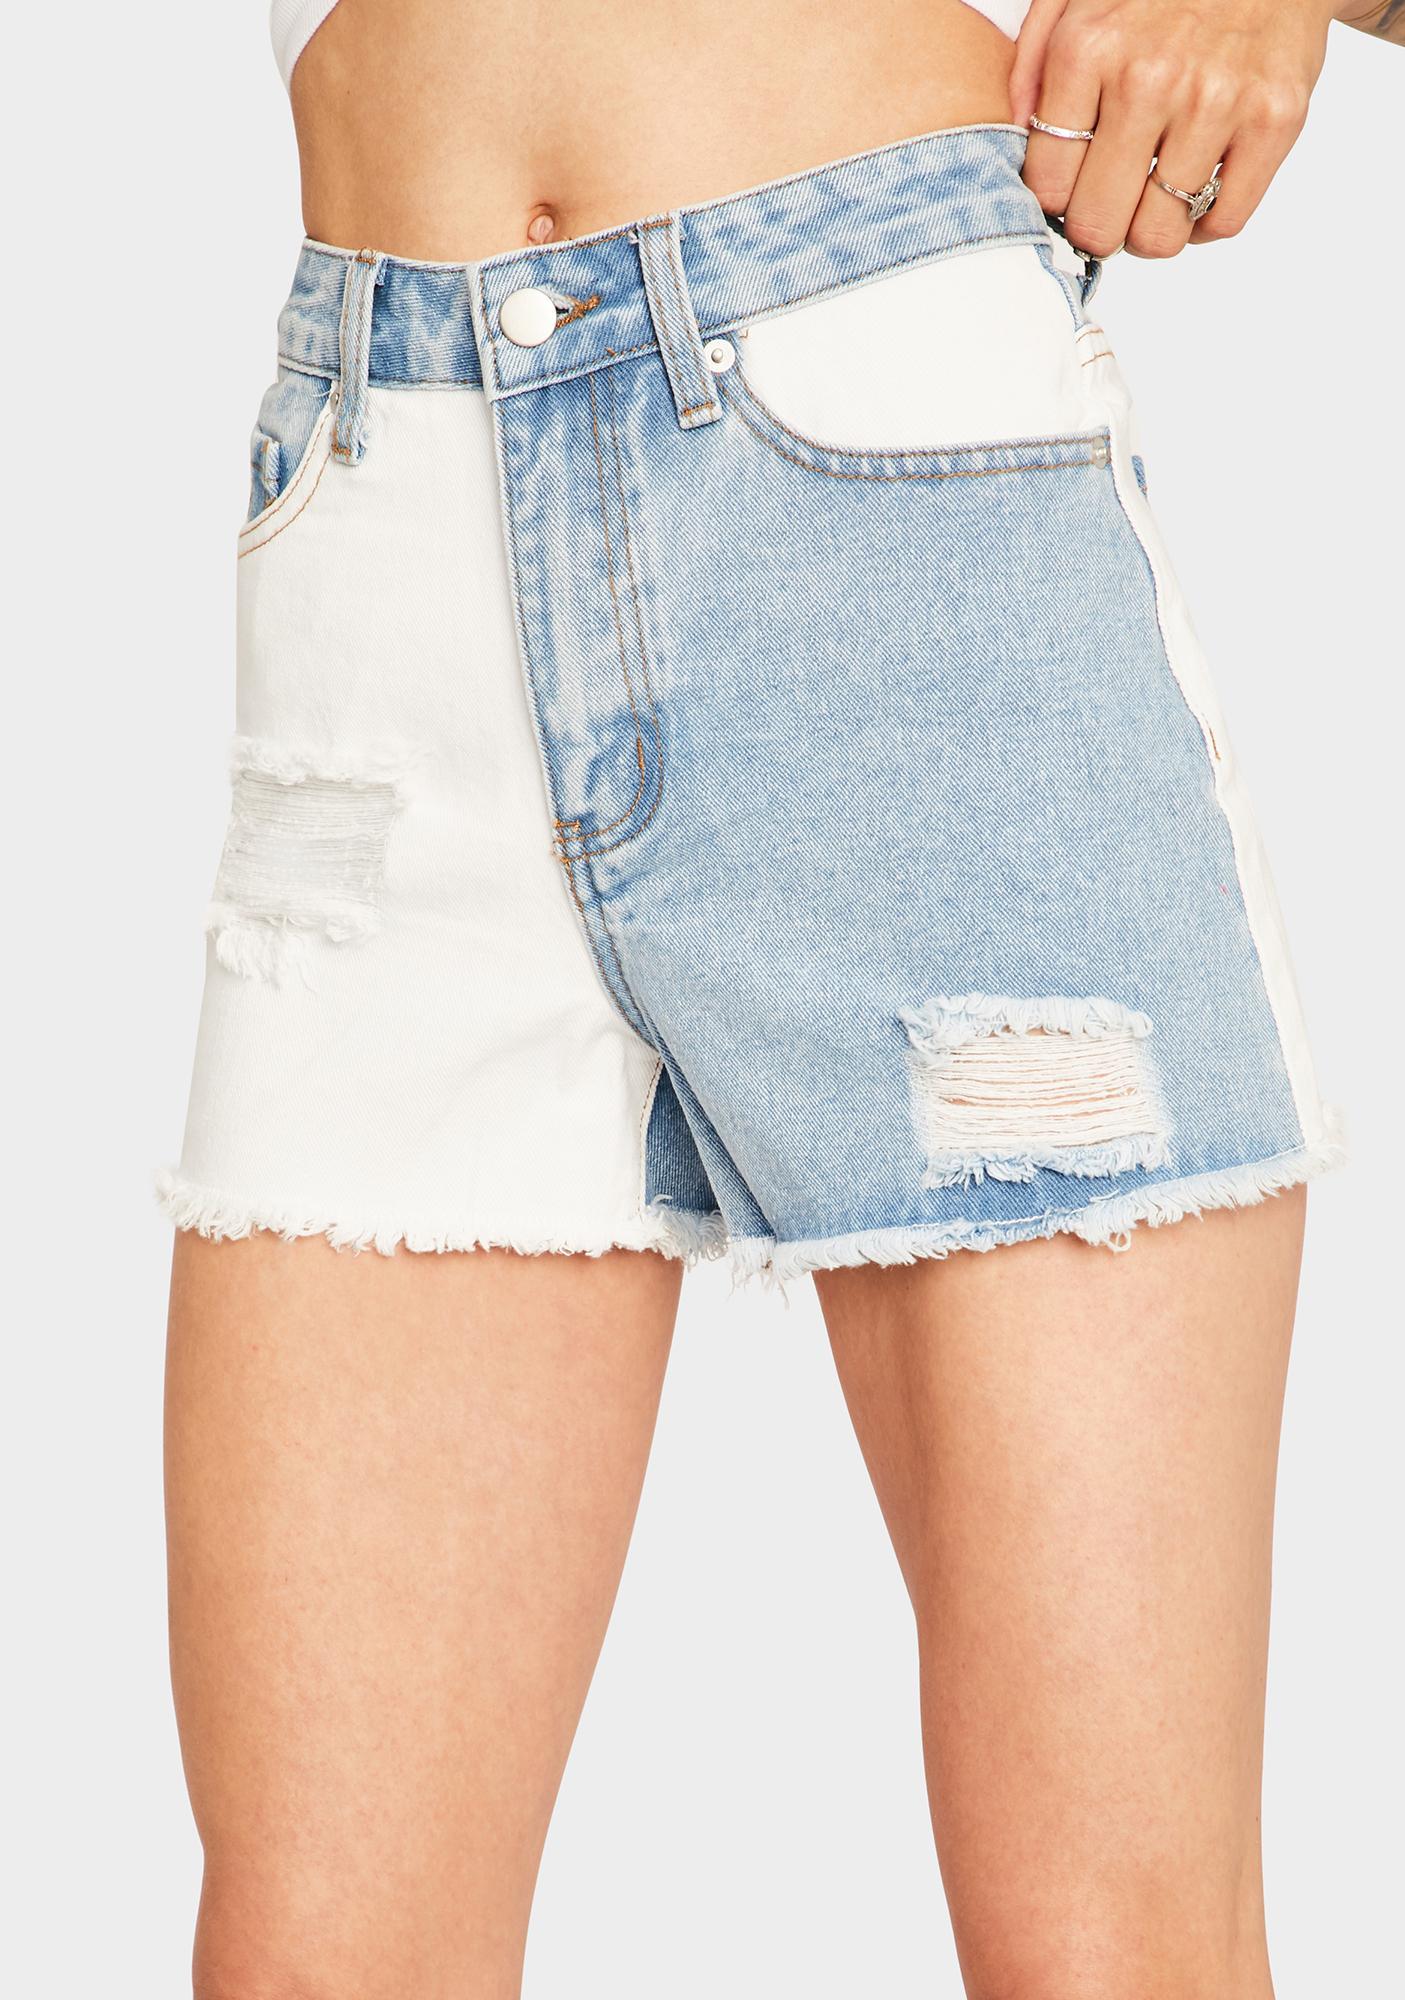 Mysterious Feeling Cutoff Shorts